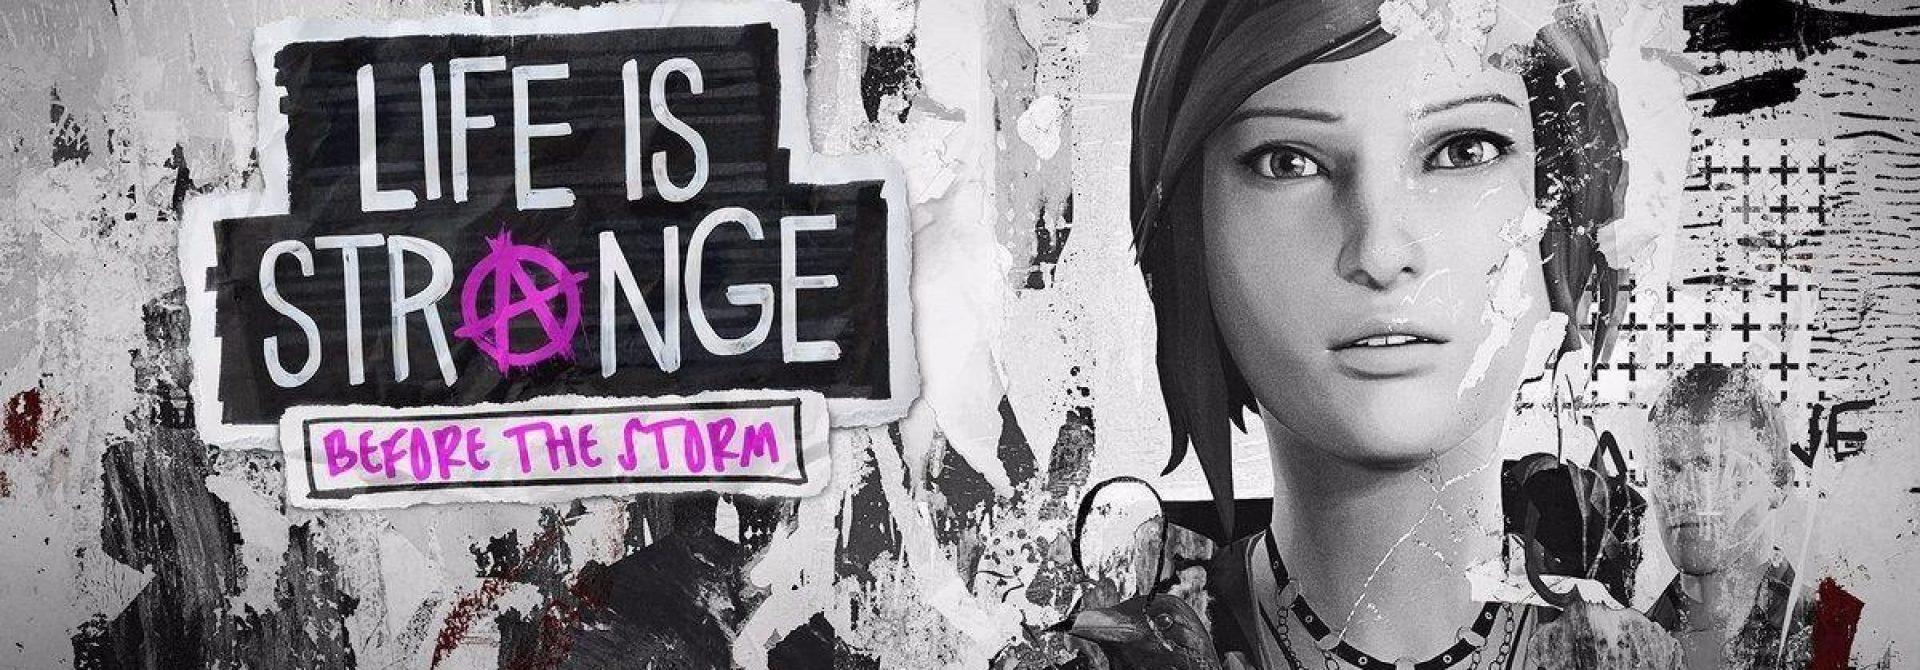 Gamescom 2017: Life Is Strange: Before The Storm Trailer